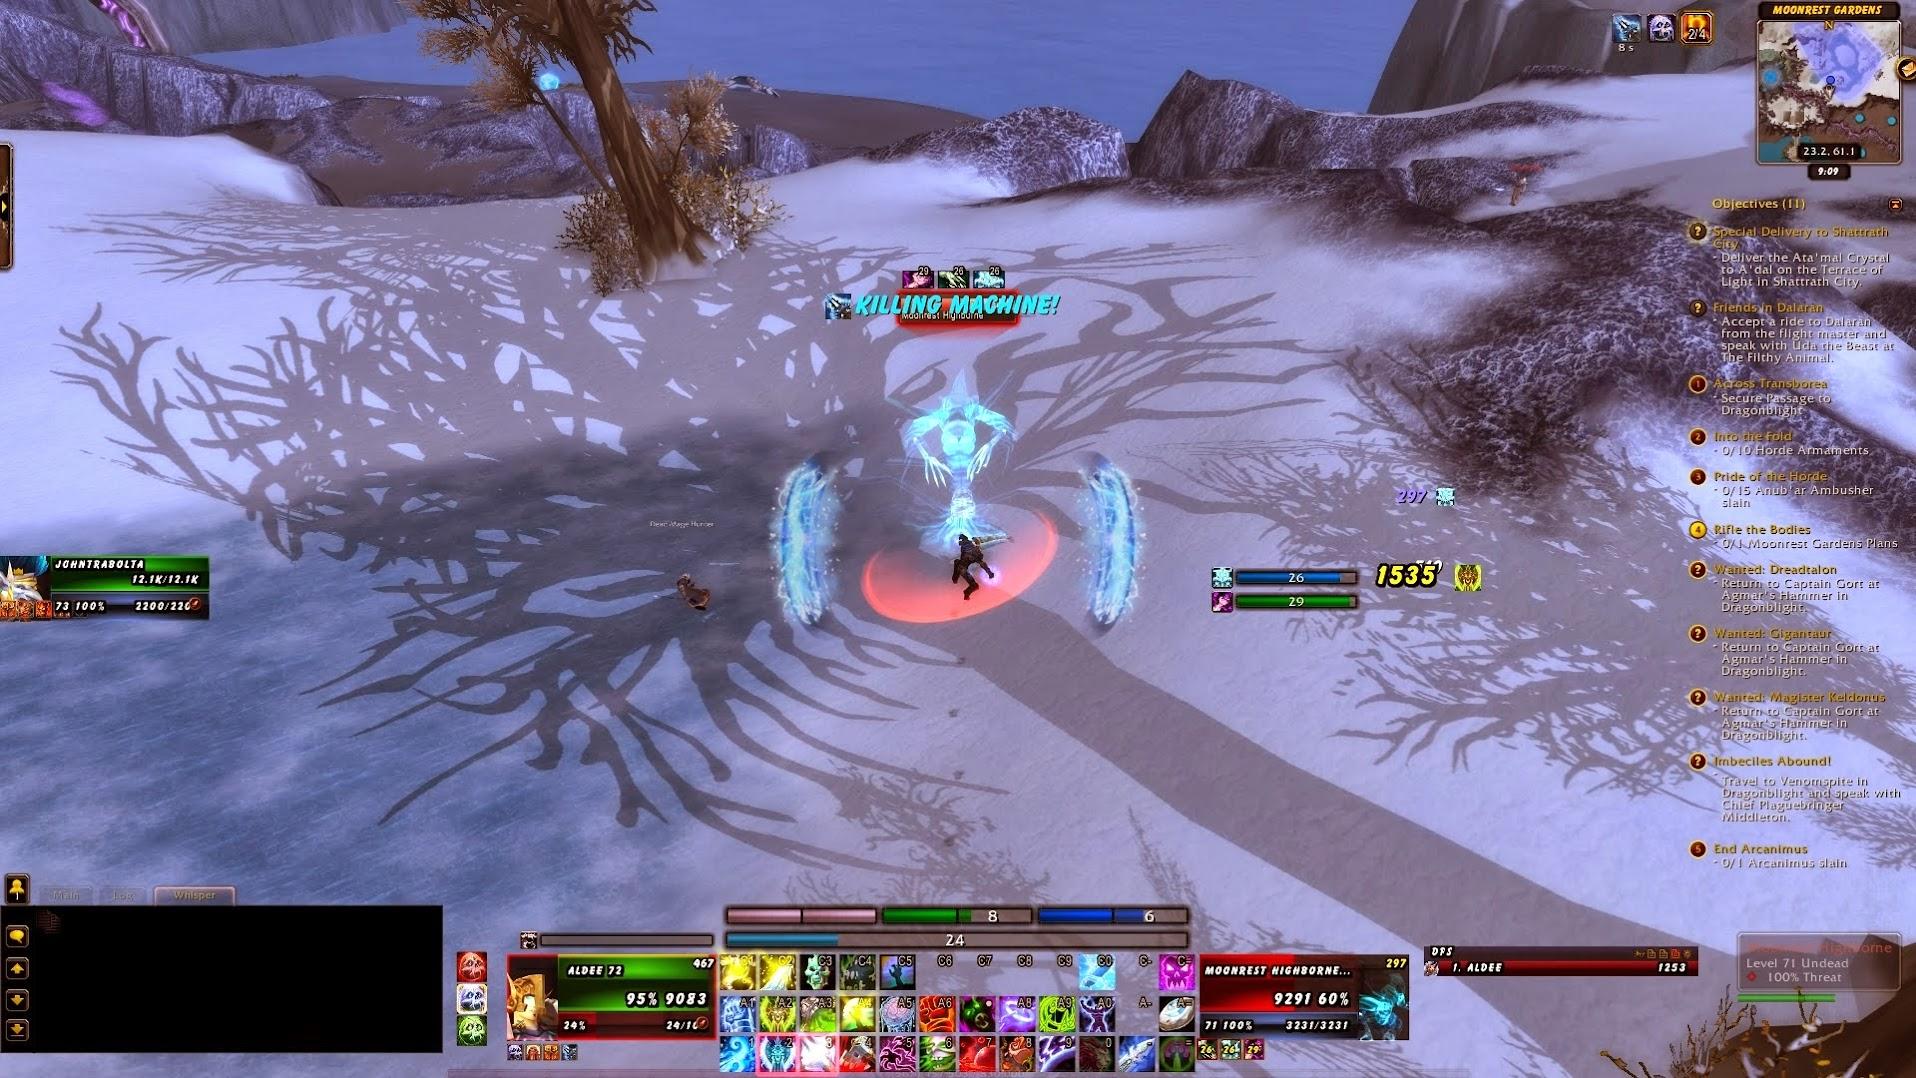 World of Warcraft Level 70 Death Knight